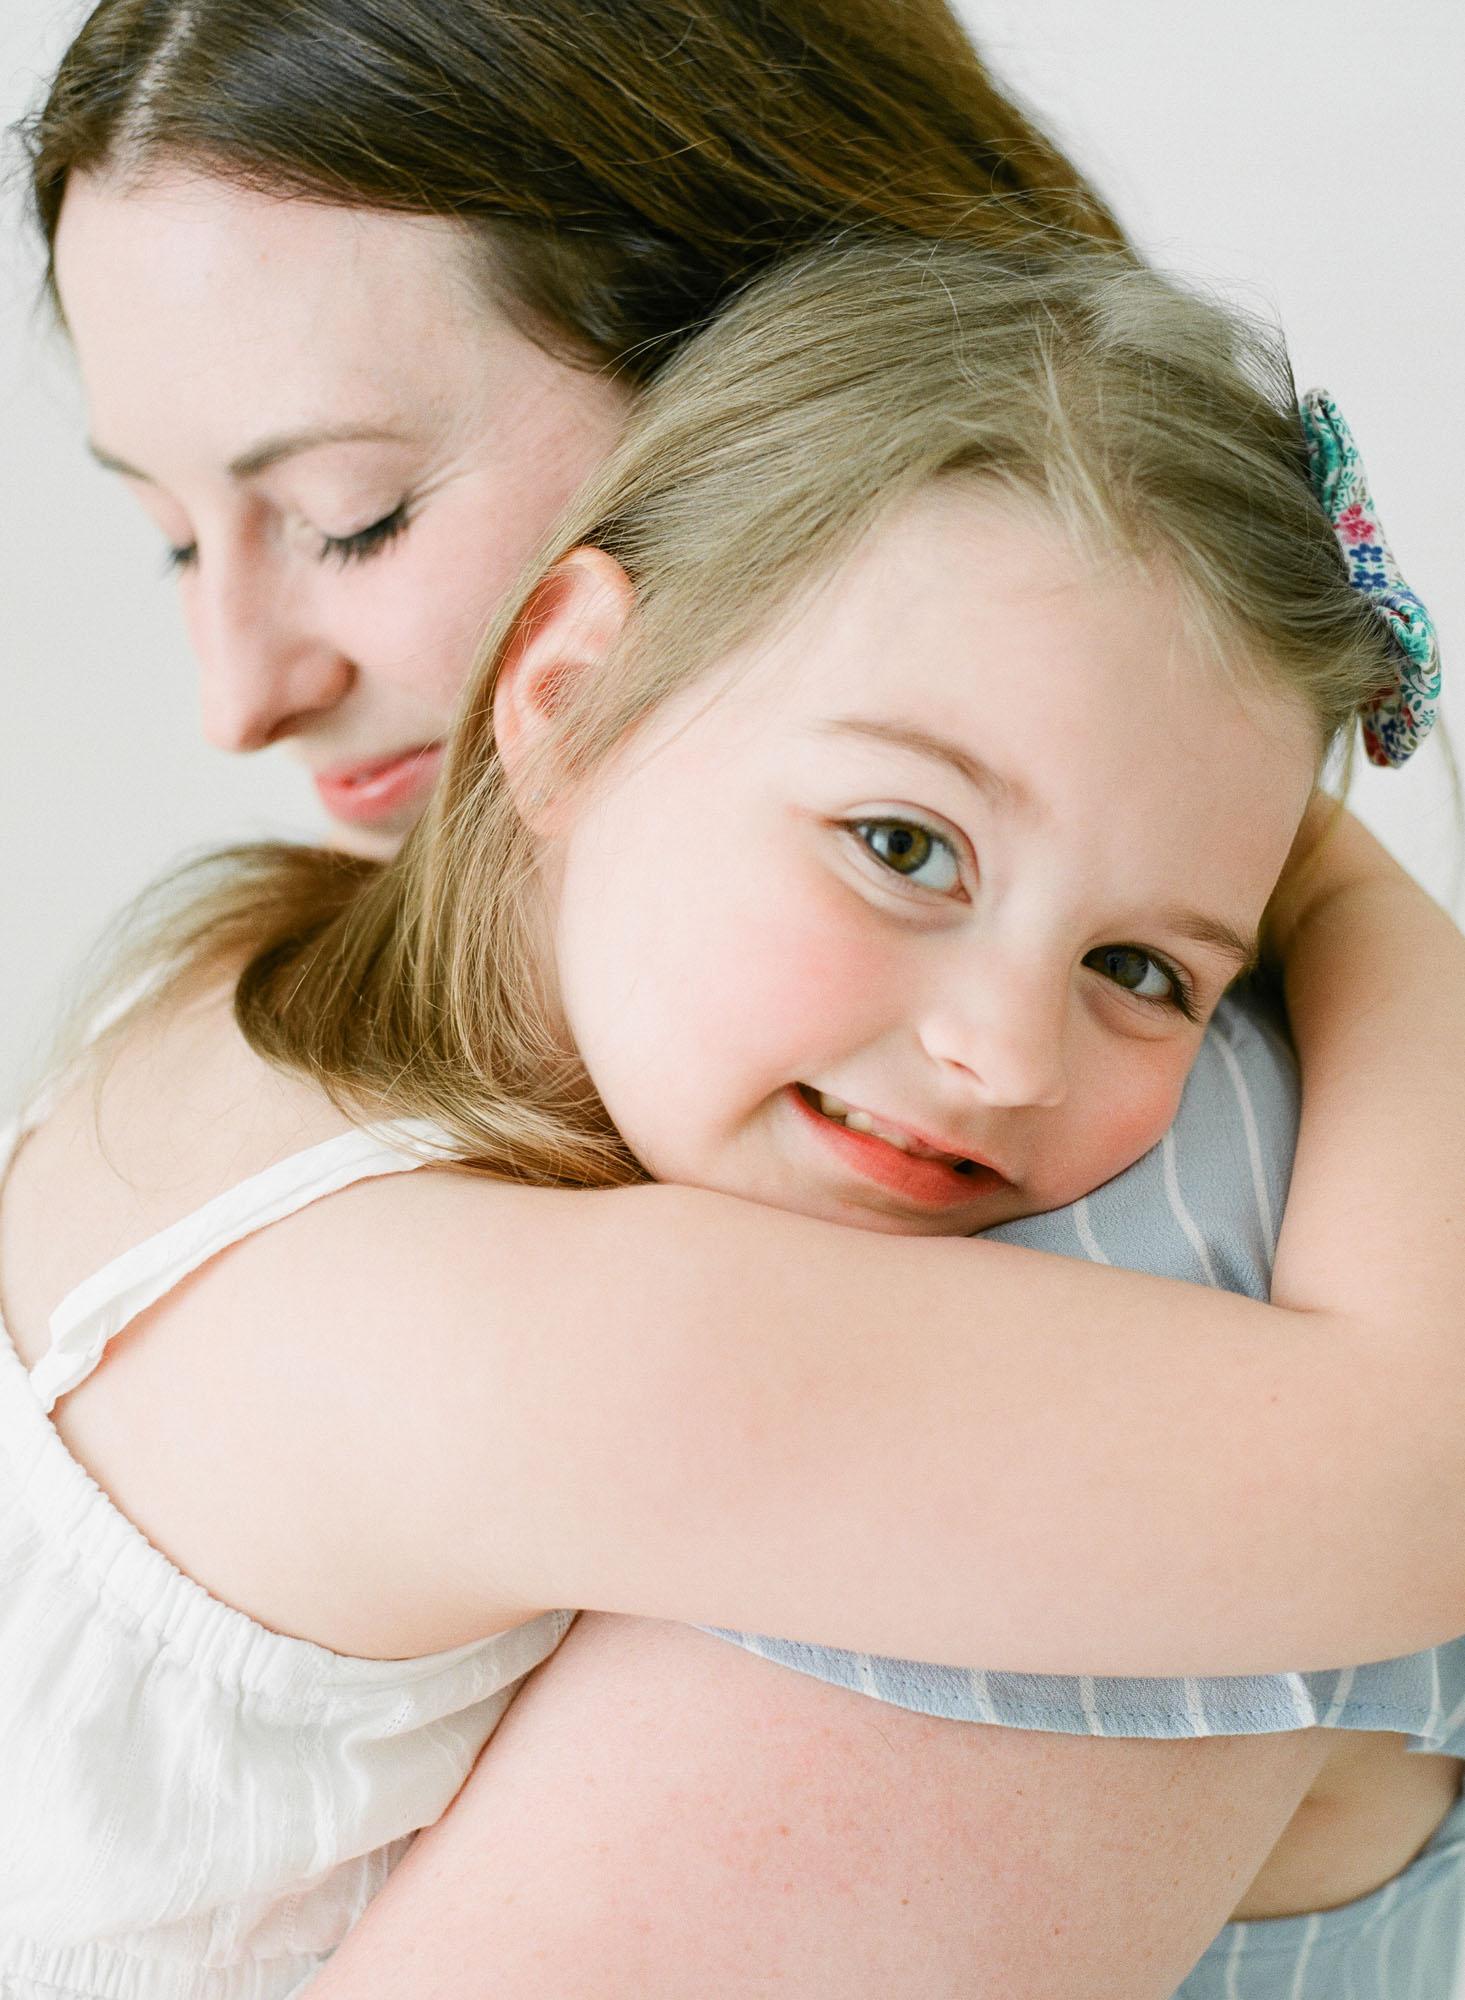 raleigh-best-family-photographer-studio-session-motherhood-001